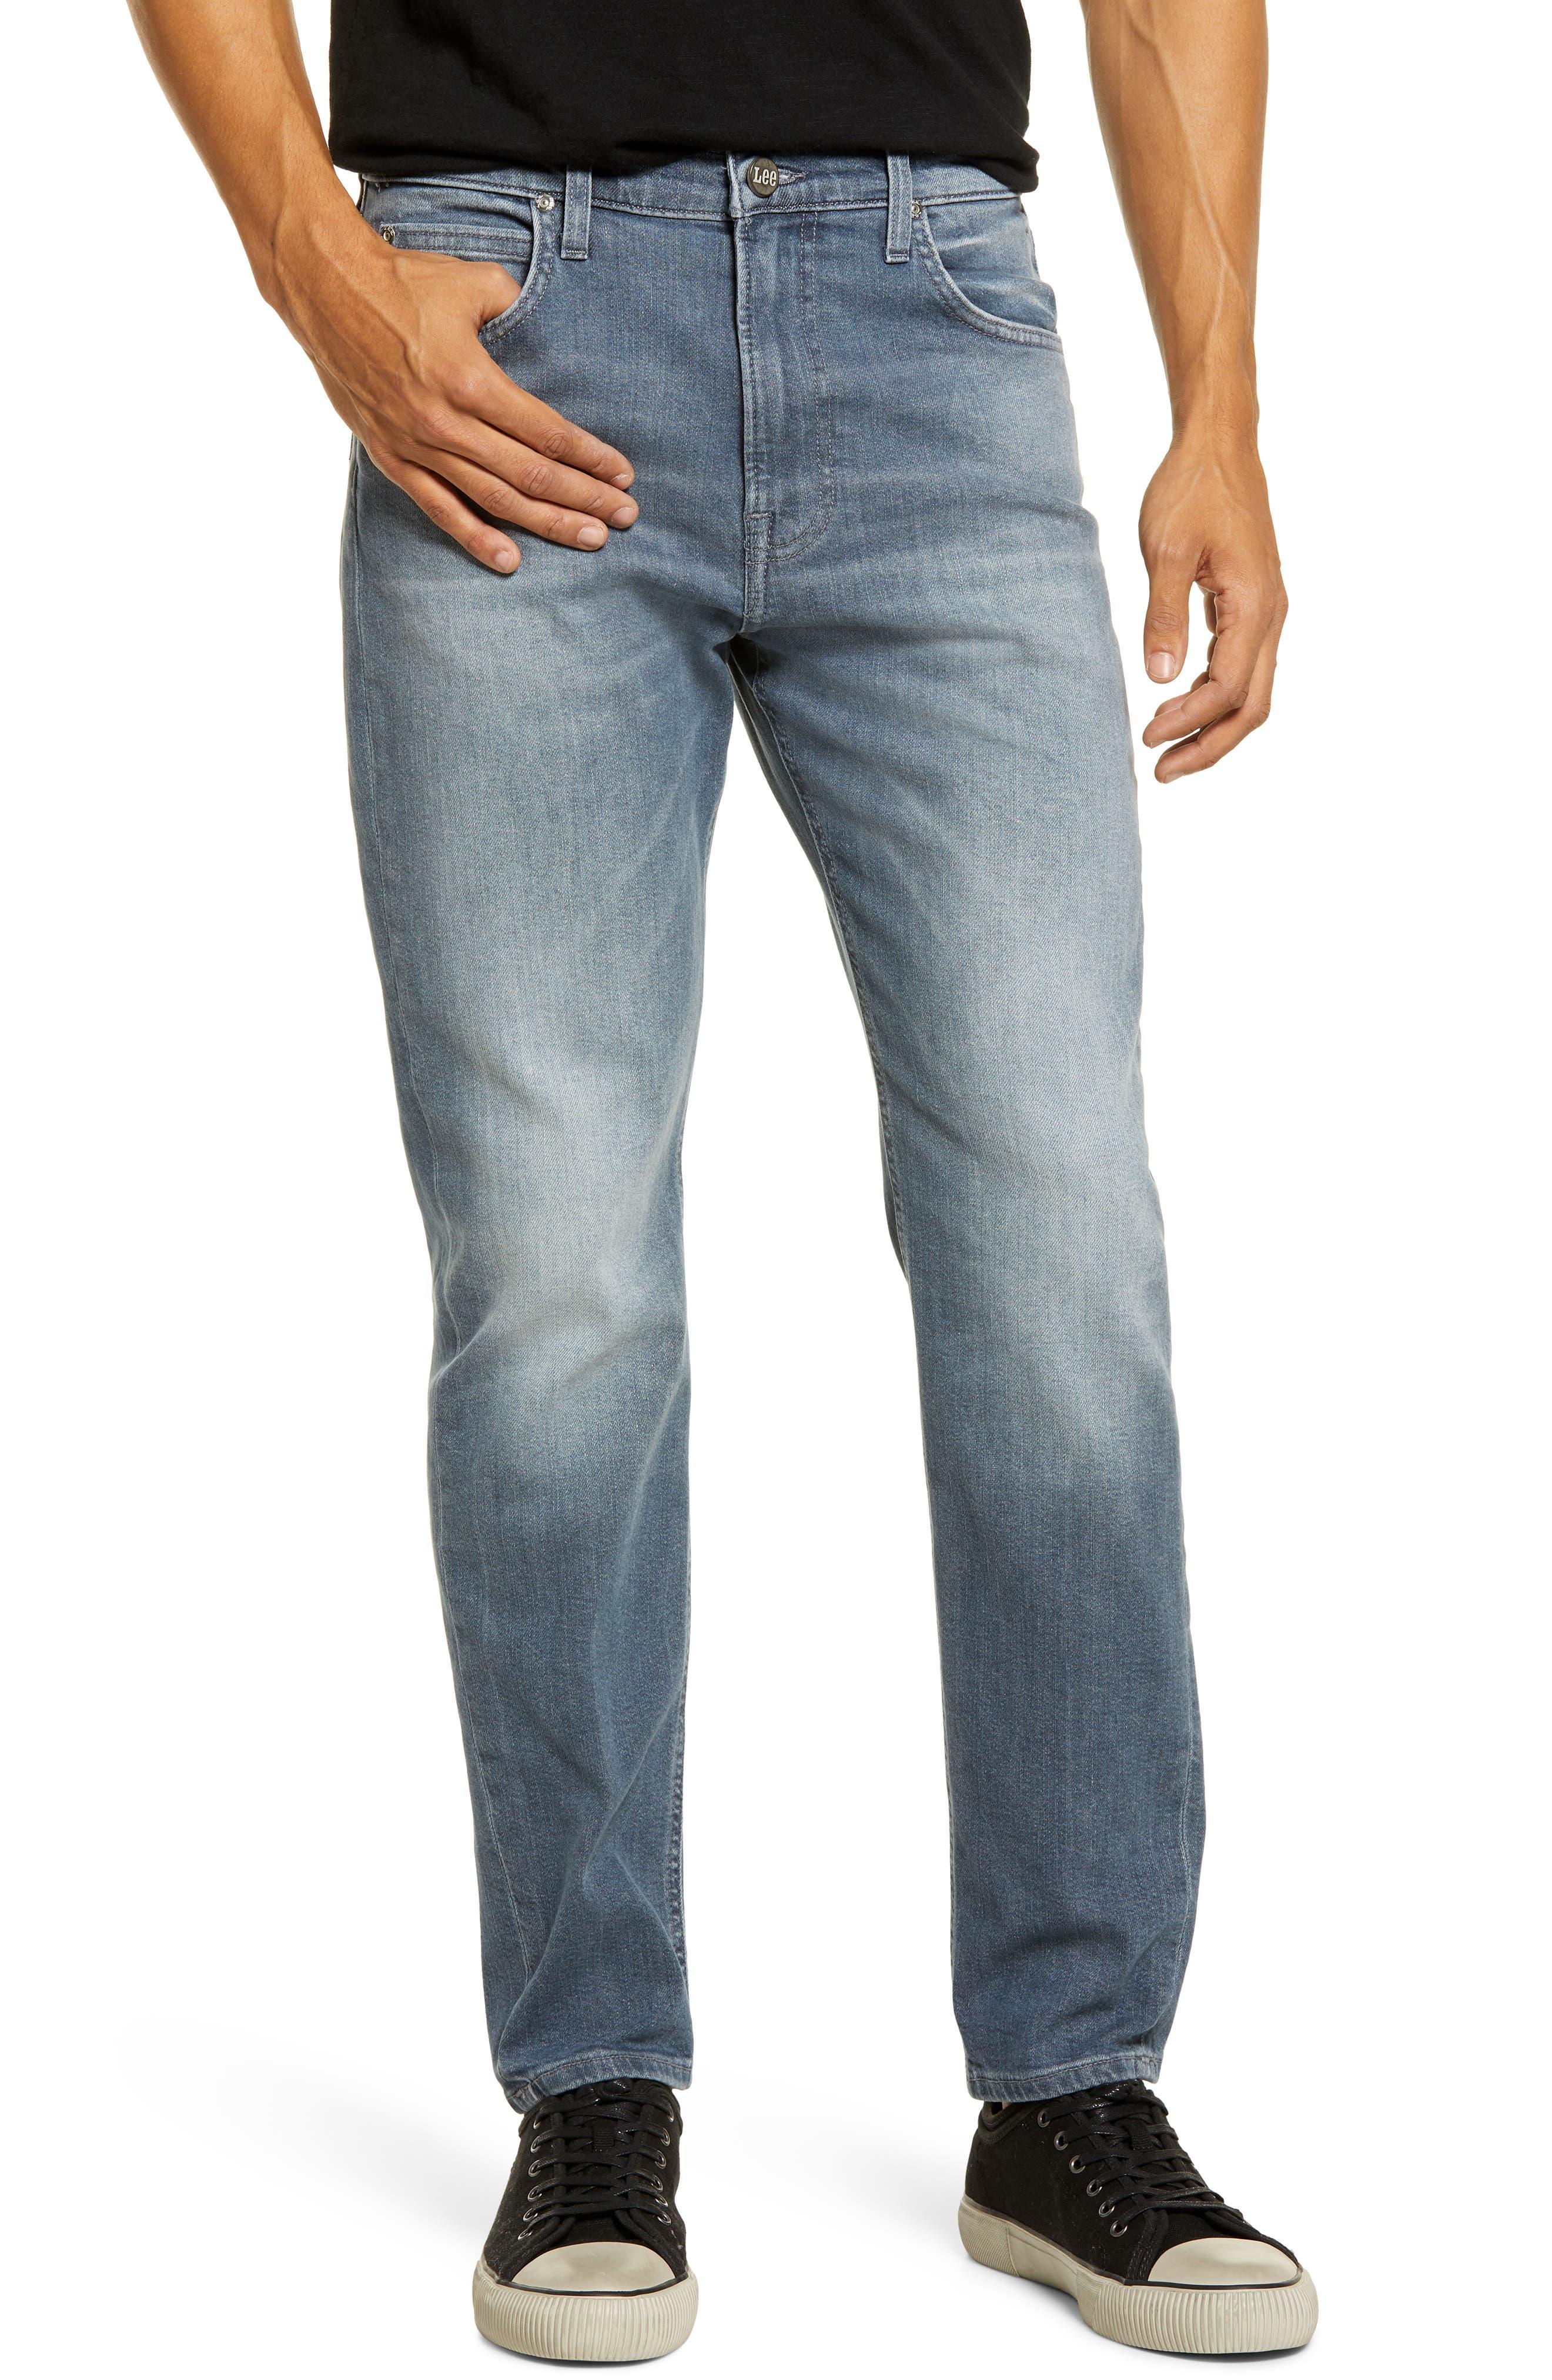 Men's Modern Austin Regular Fit Tapered Jeans